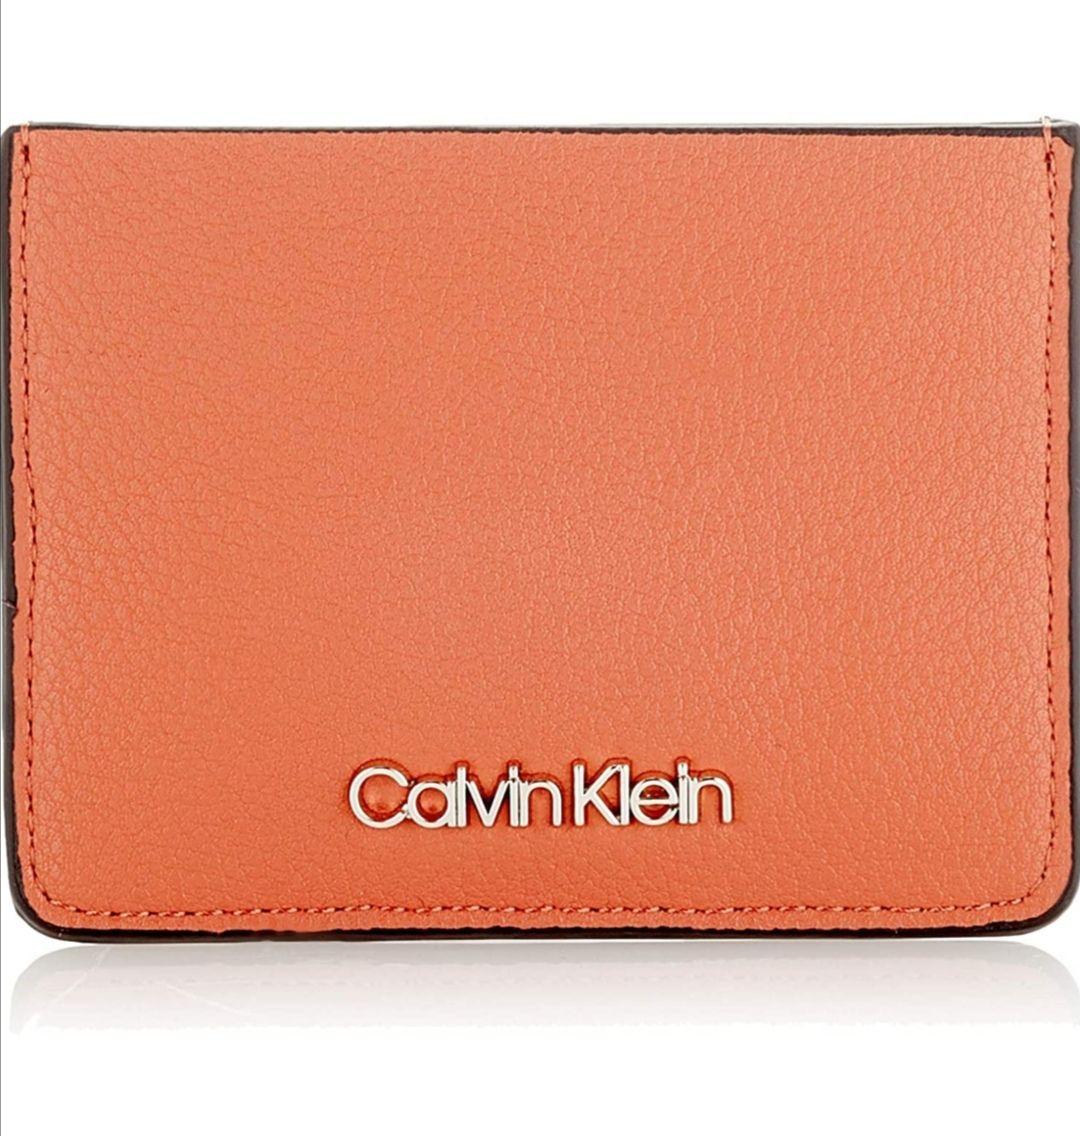 Tarjetero Calvin Klein marrón.